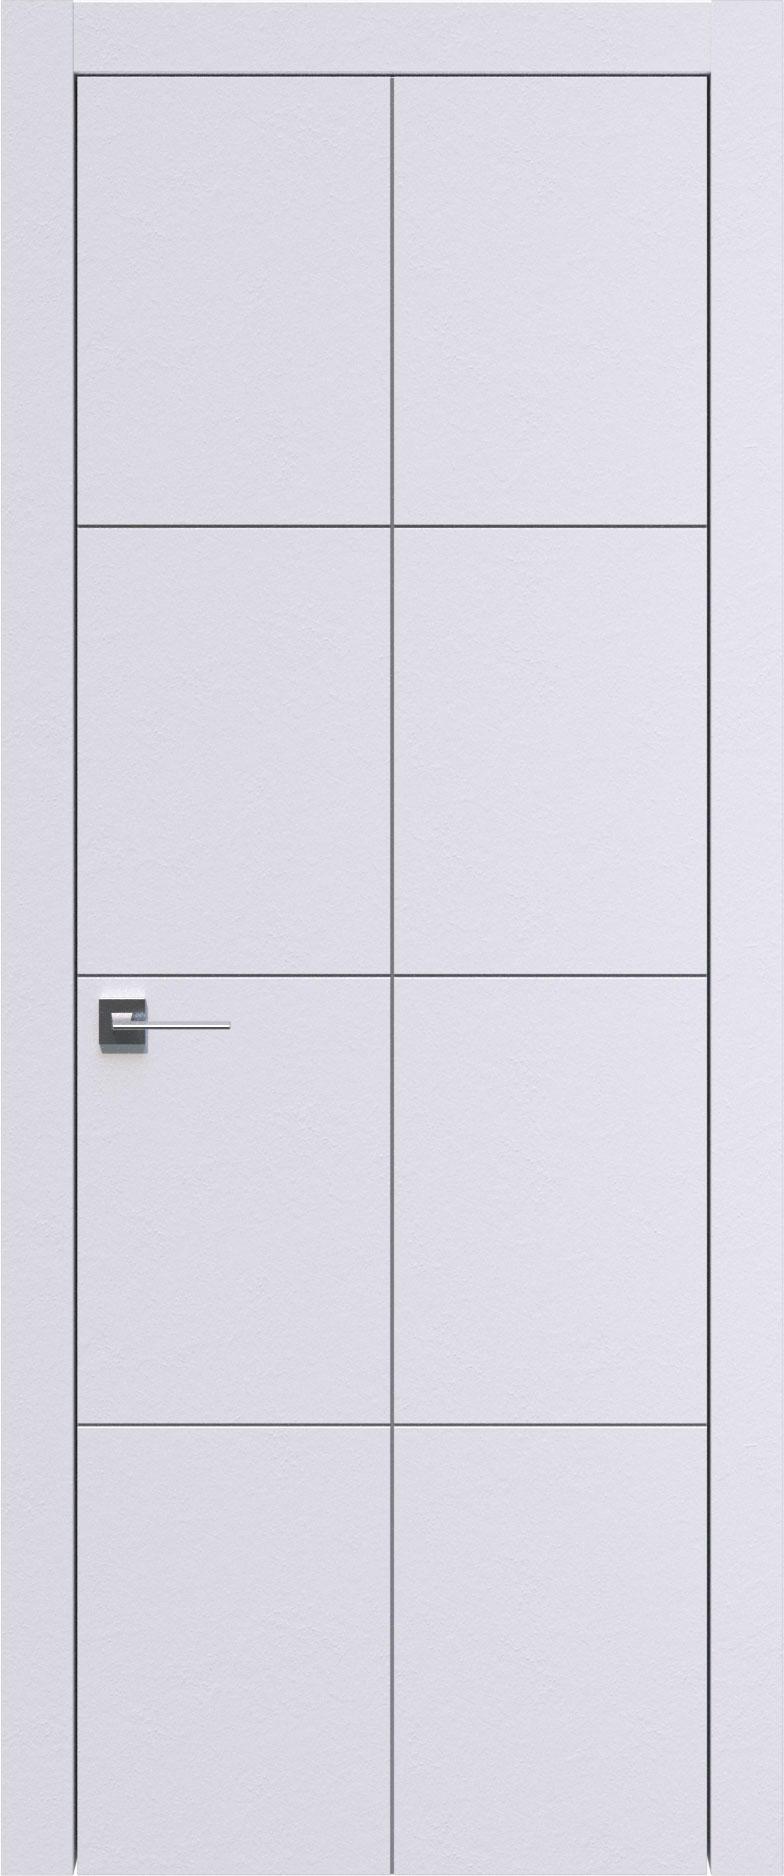 Tivoli Л-2 цвет - Арктик белый Без стекла (ДГ)